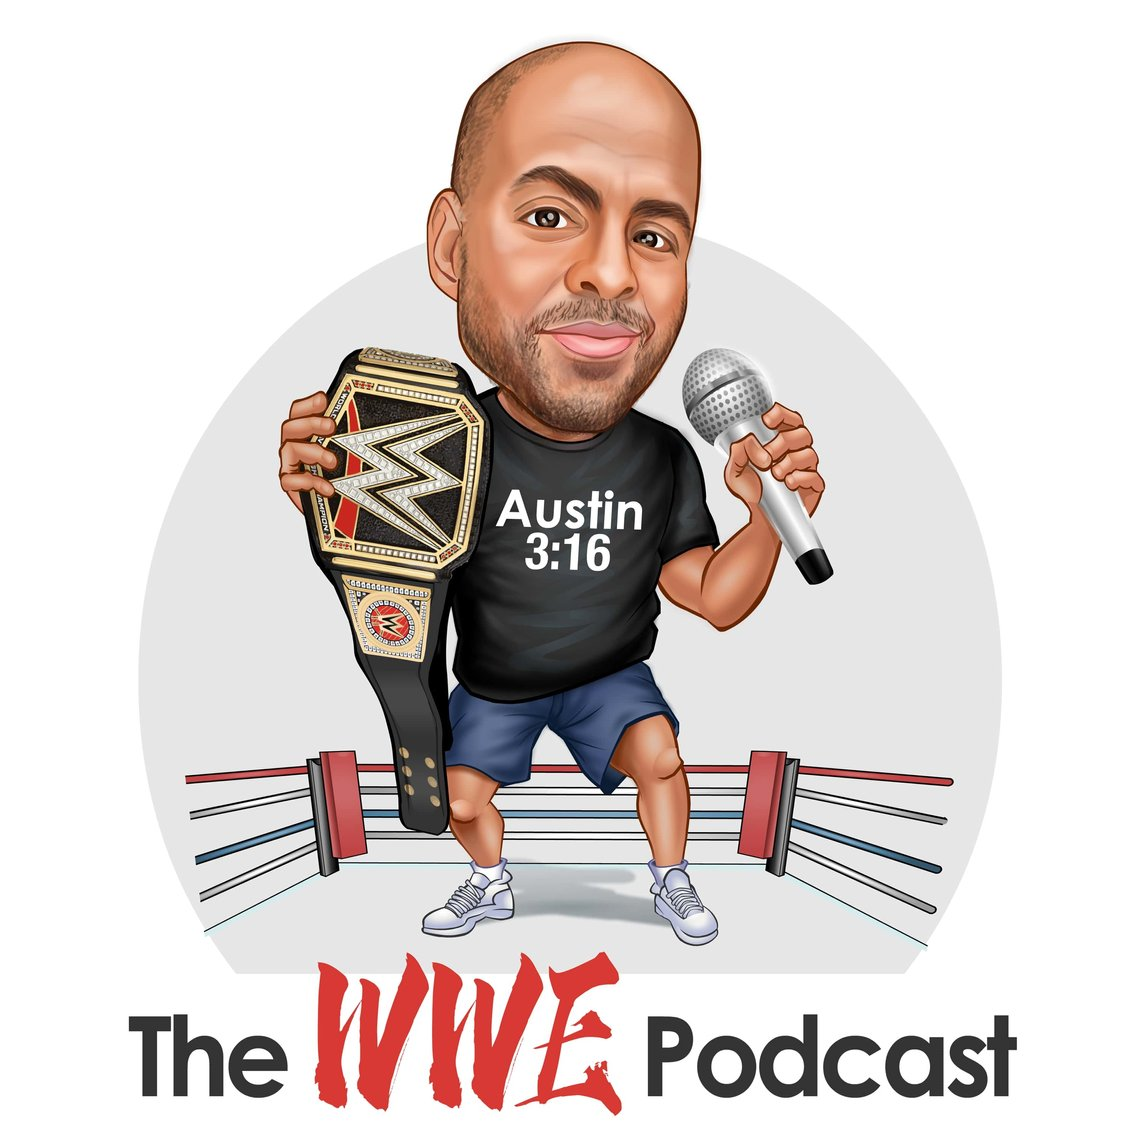 The WWE Podcast - immagine di copertina